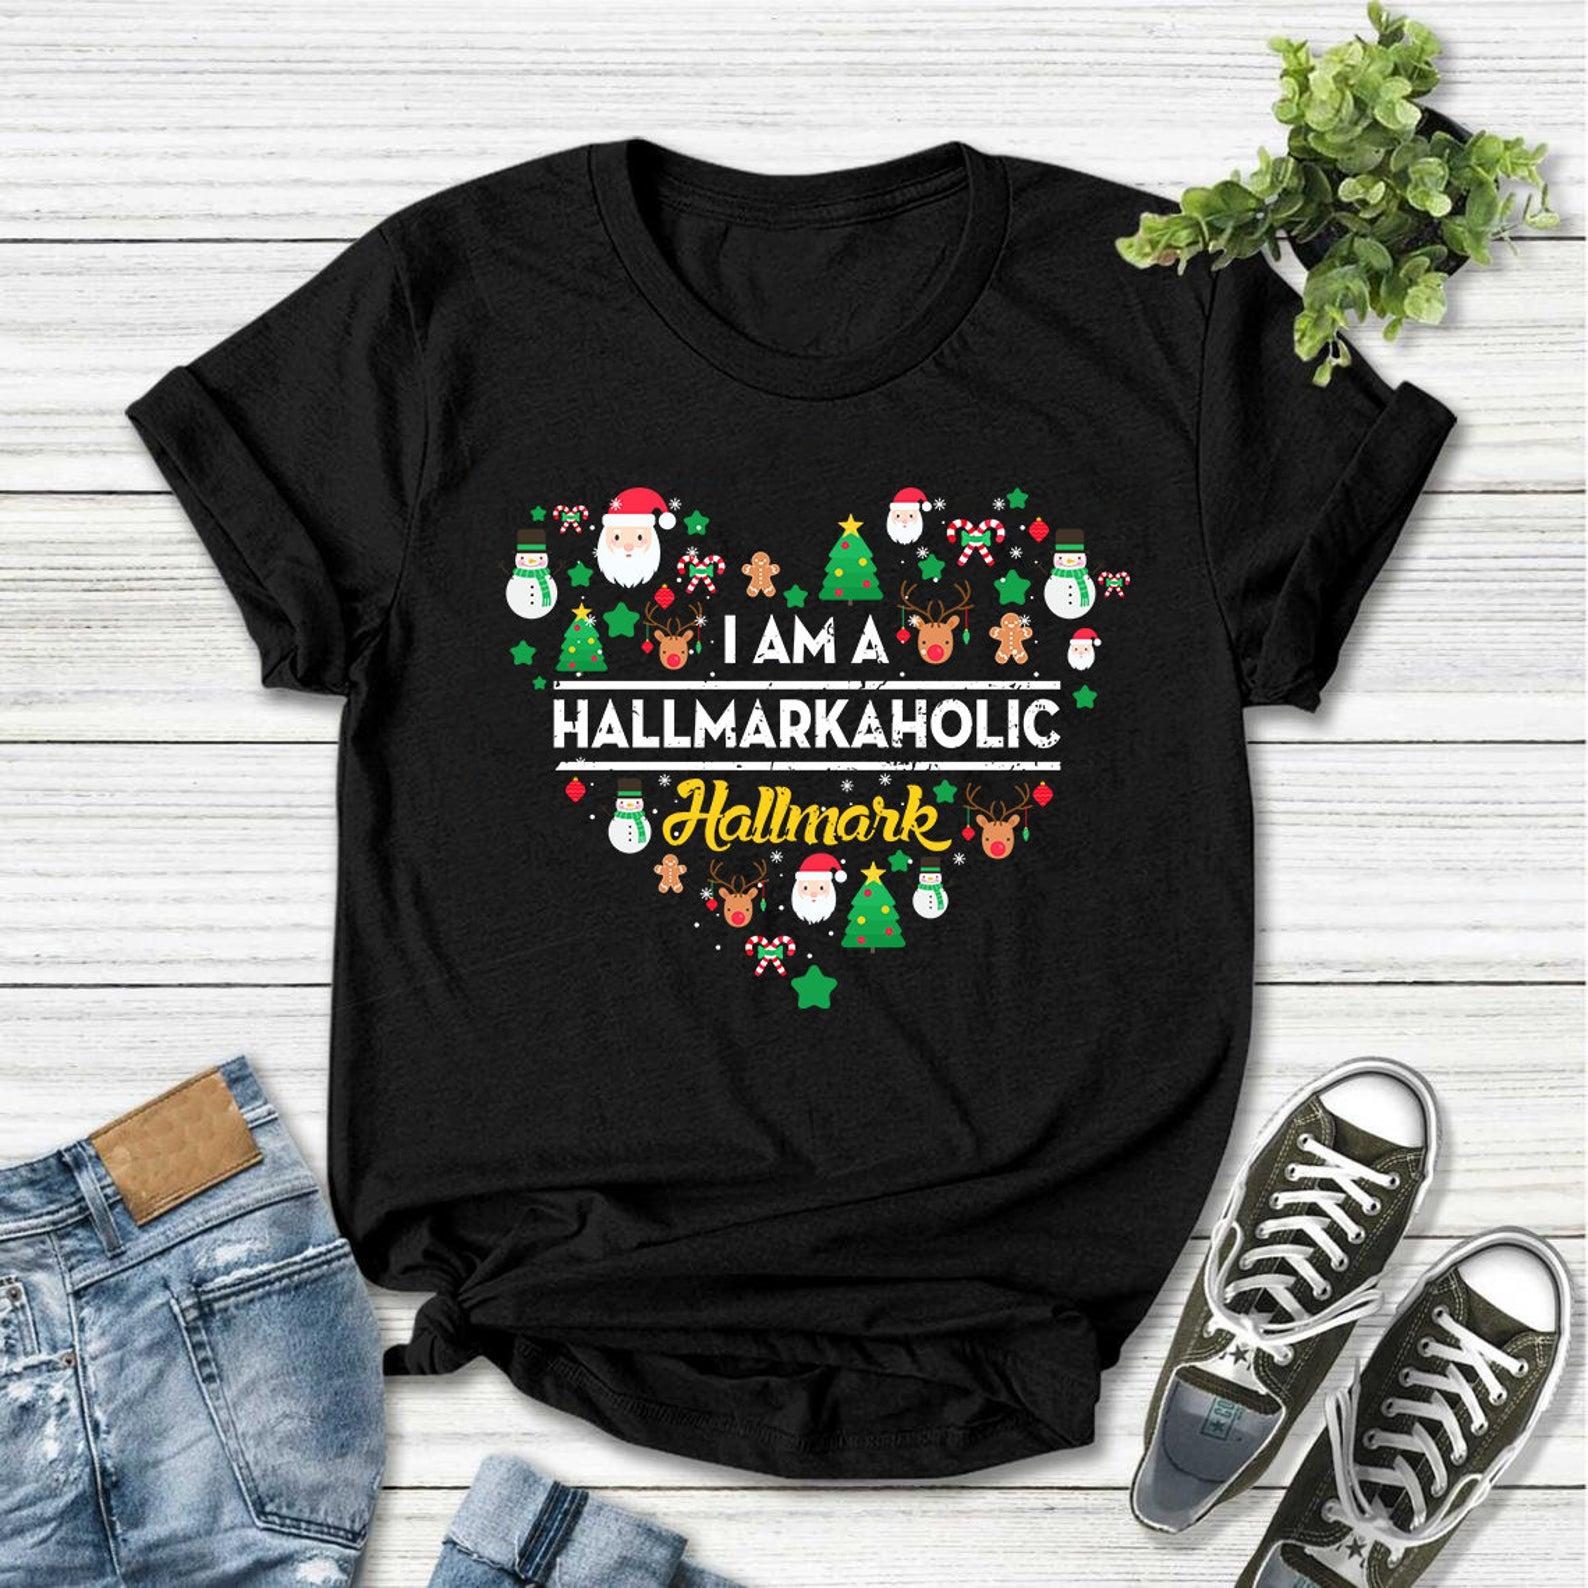 hallmarkaholic shirt